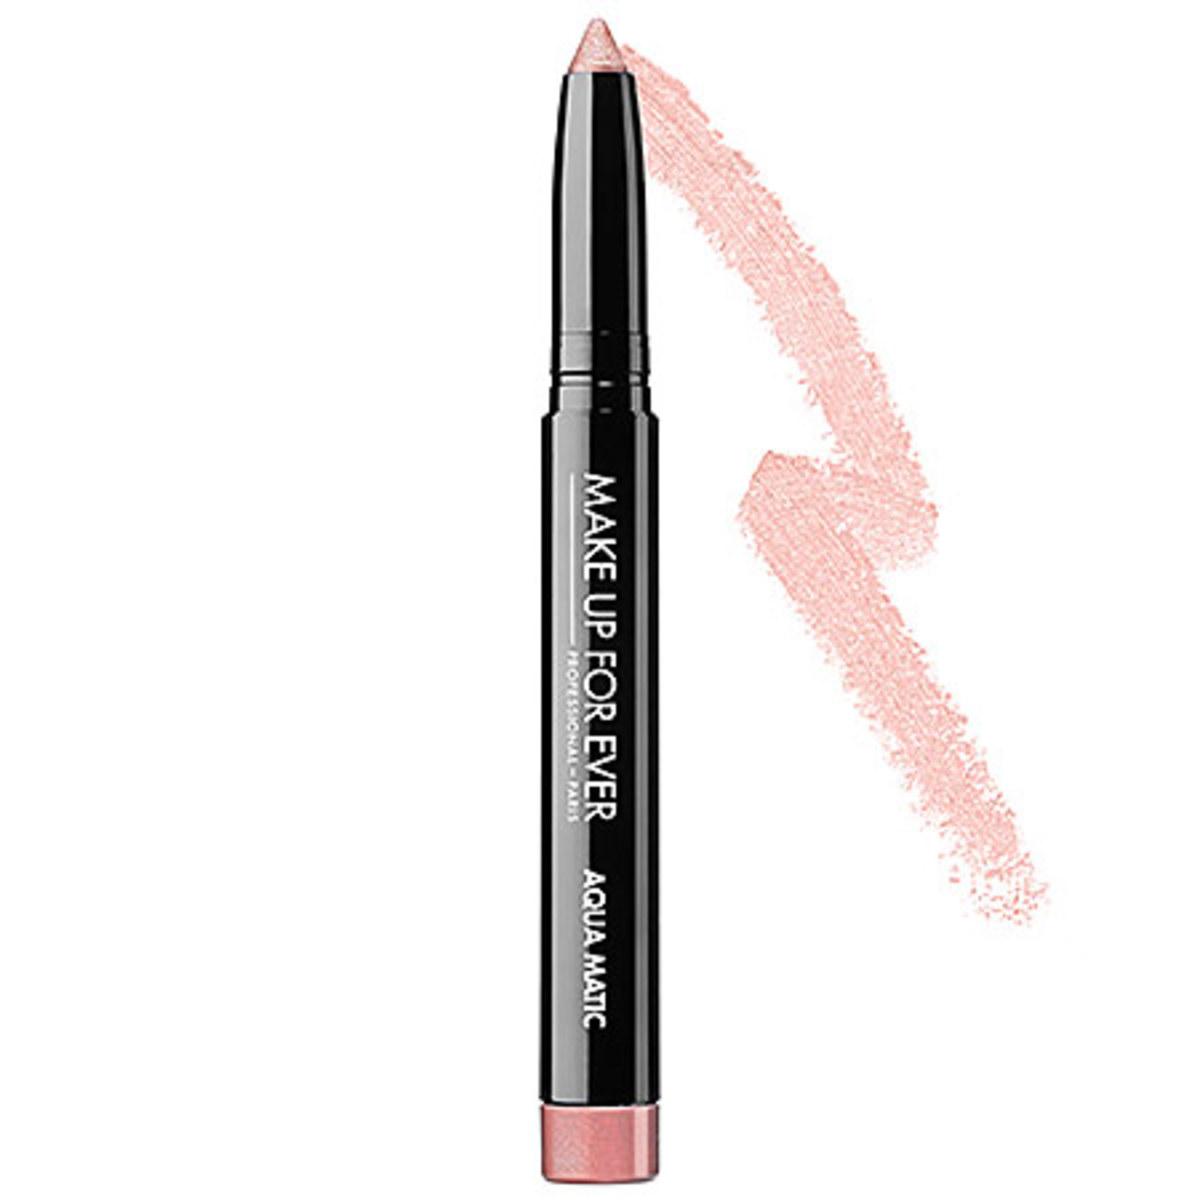 Make Up For Ever Aqua Matic in Metallic Pinky Beige